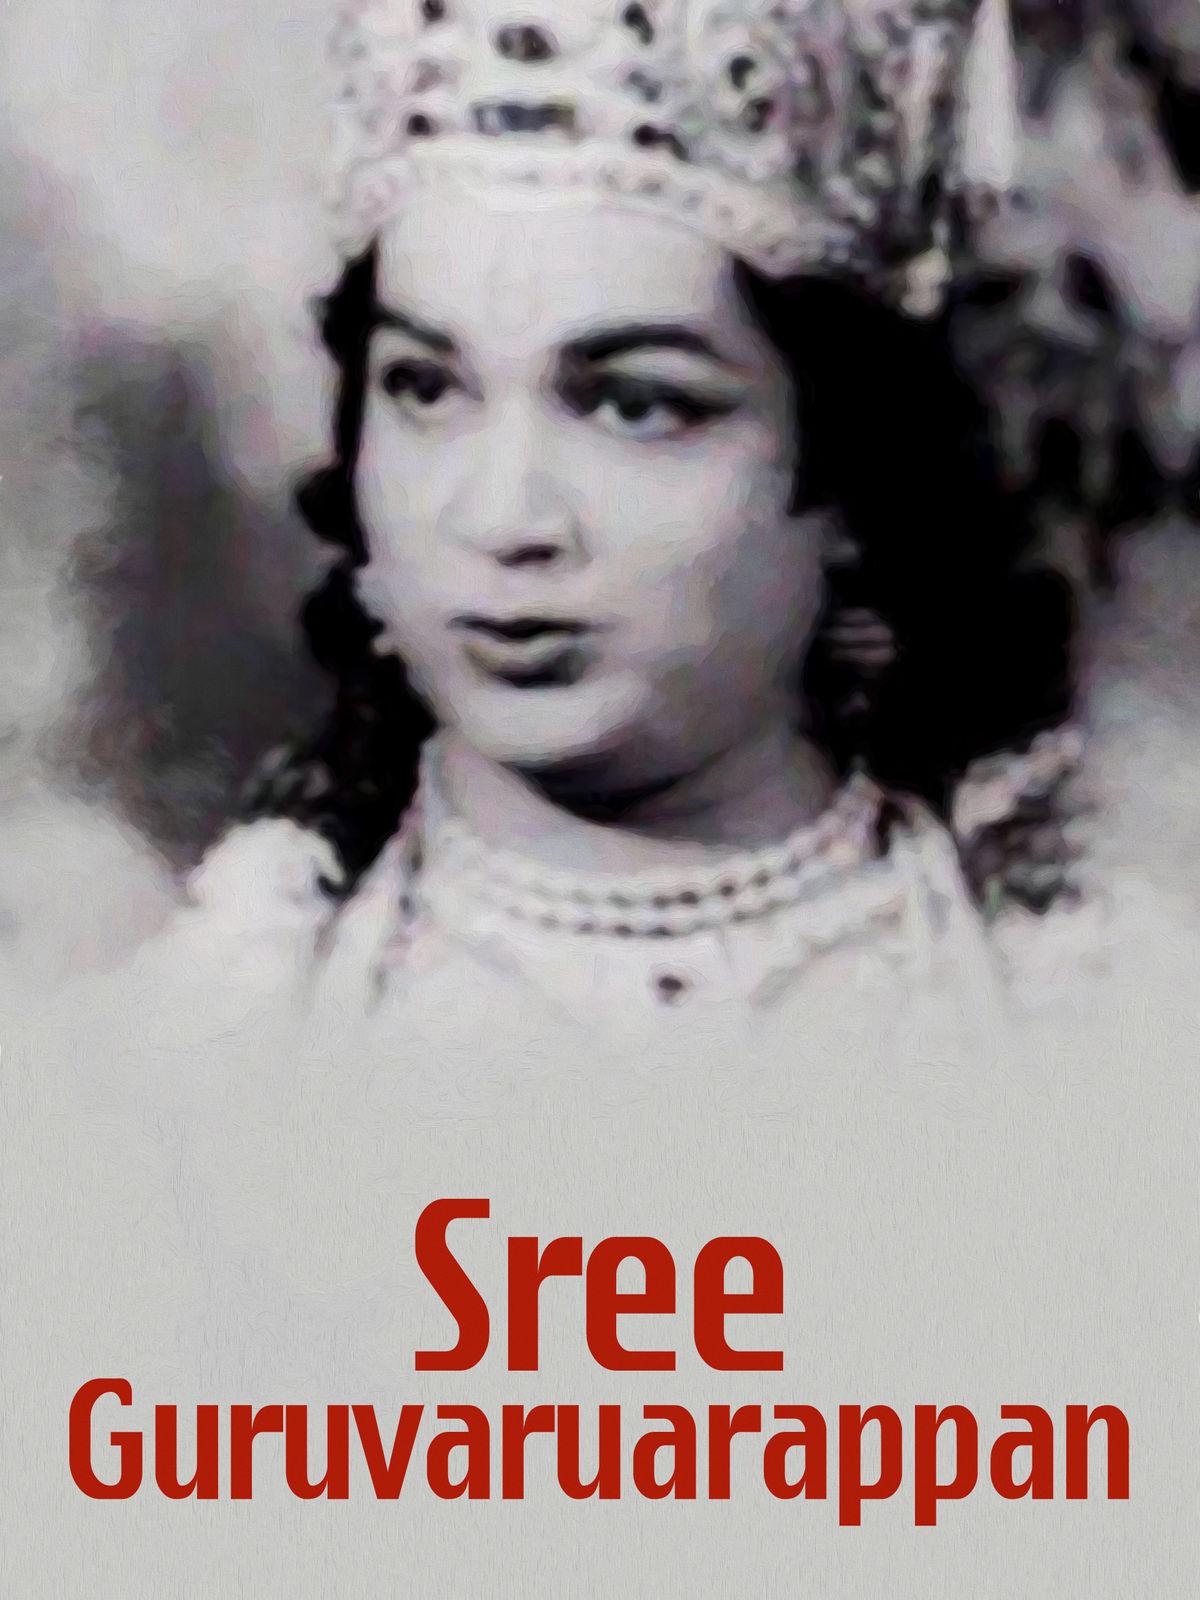 Sree Guruvaruarappan